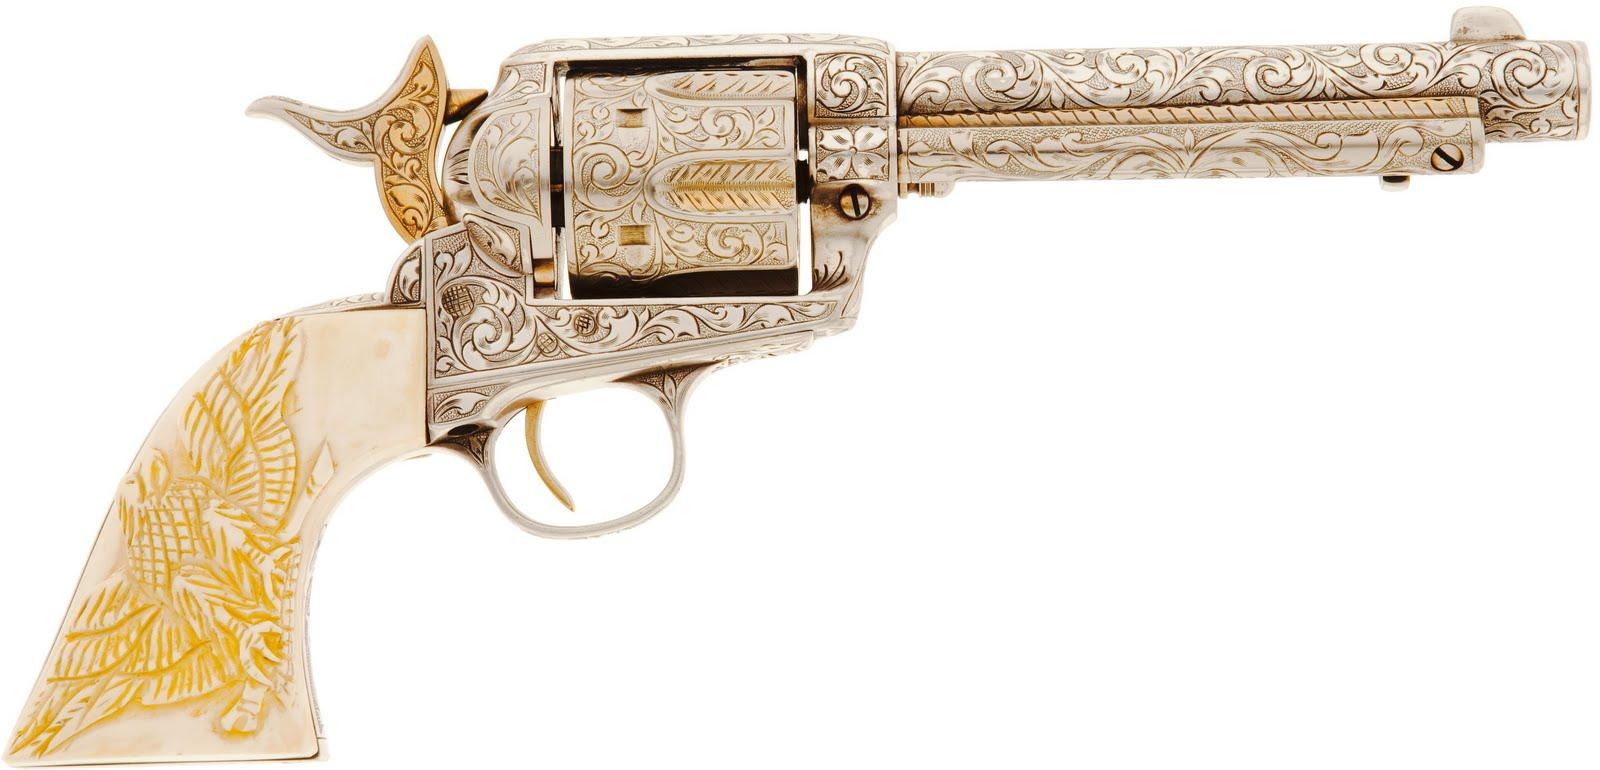 Engraving Guns Styles Gun Engraving Meets The Custom